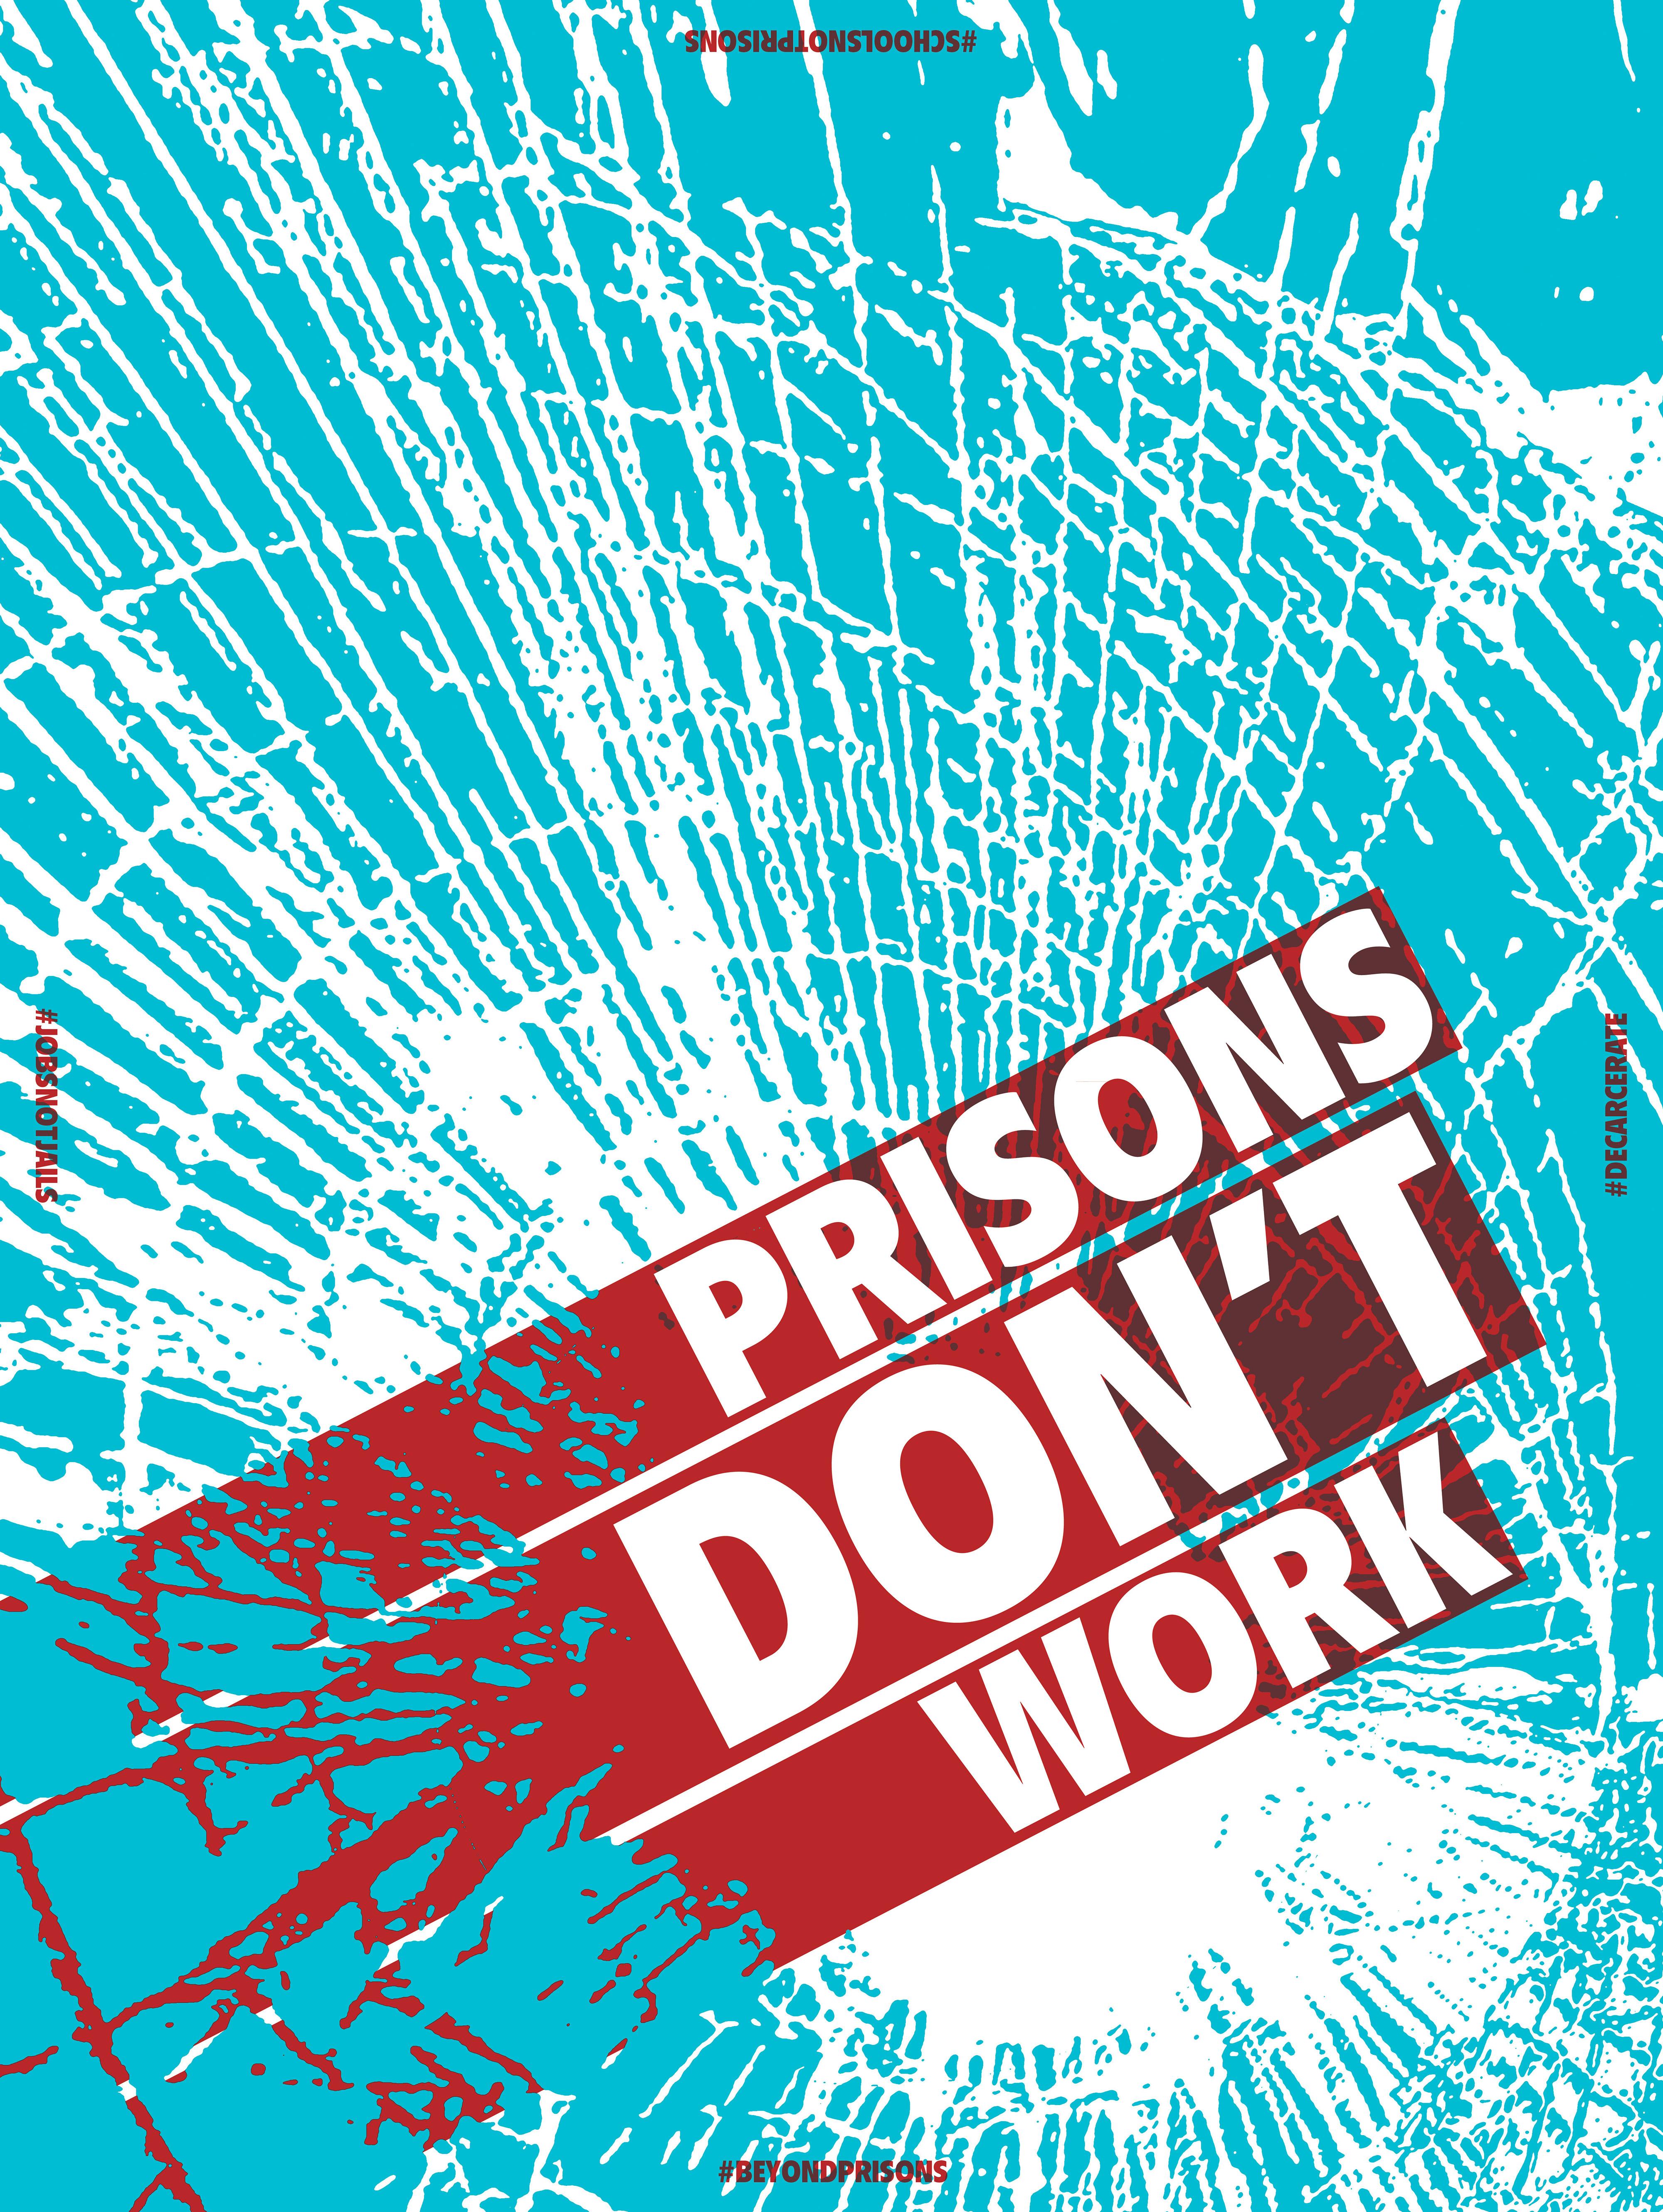 Large_MacPhee_PrisonsDontWork_Prisons_Amplifier-2.jpg